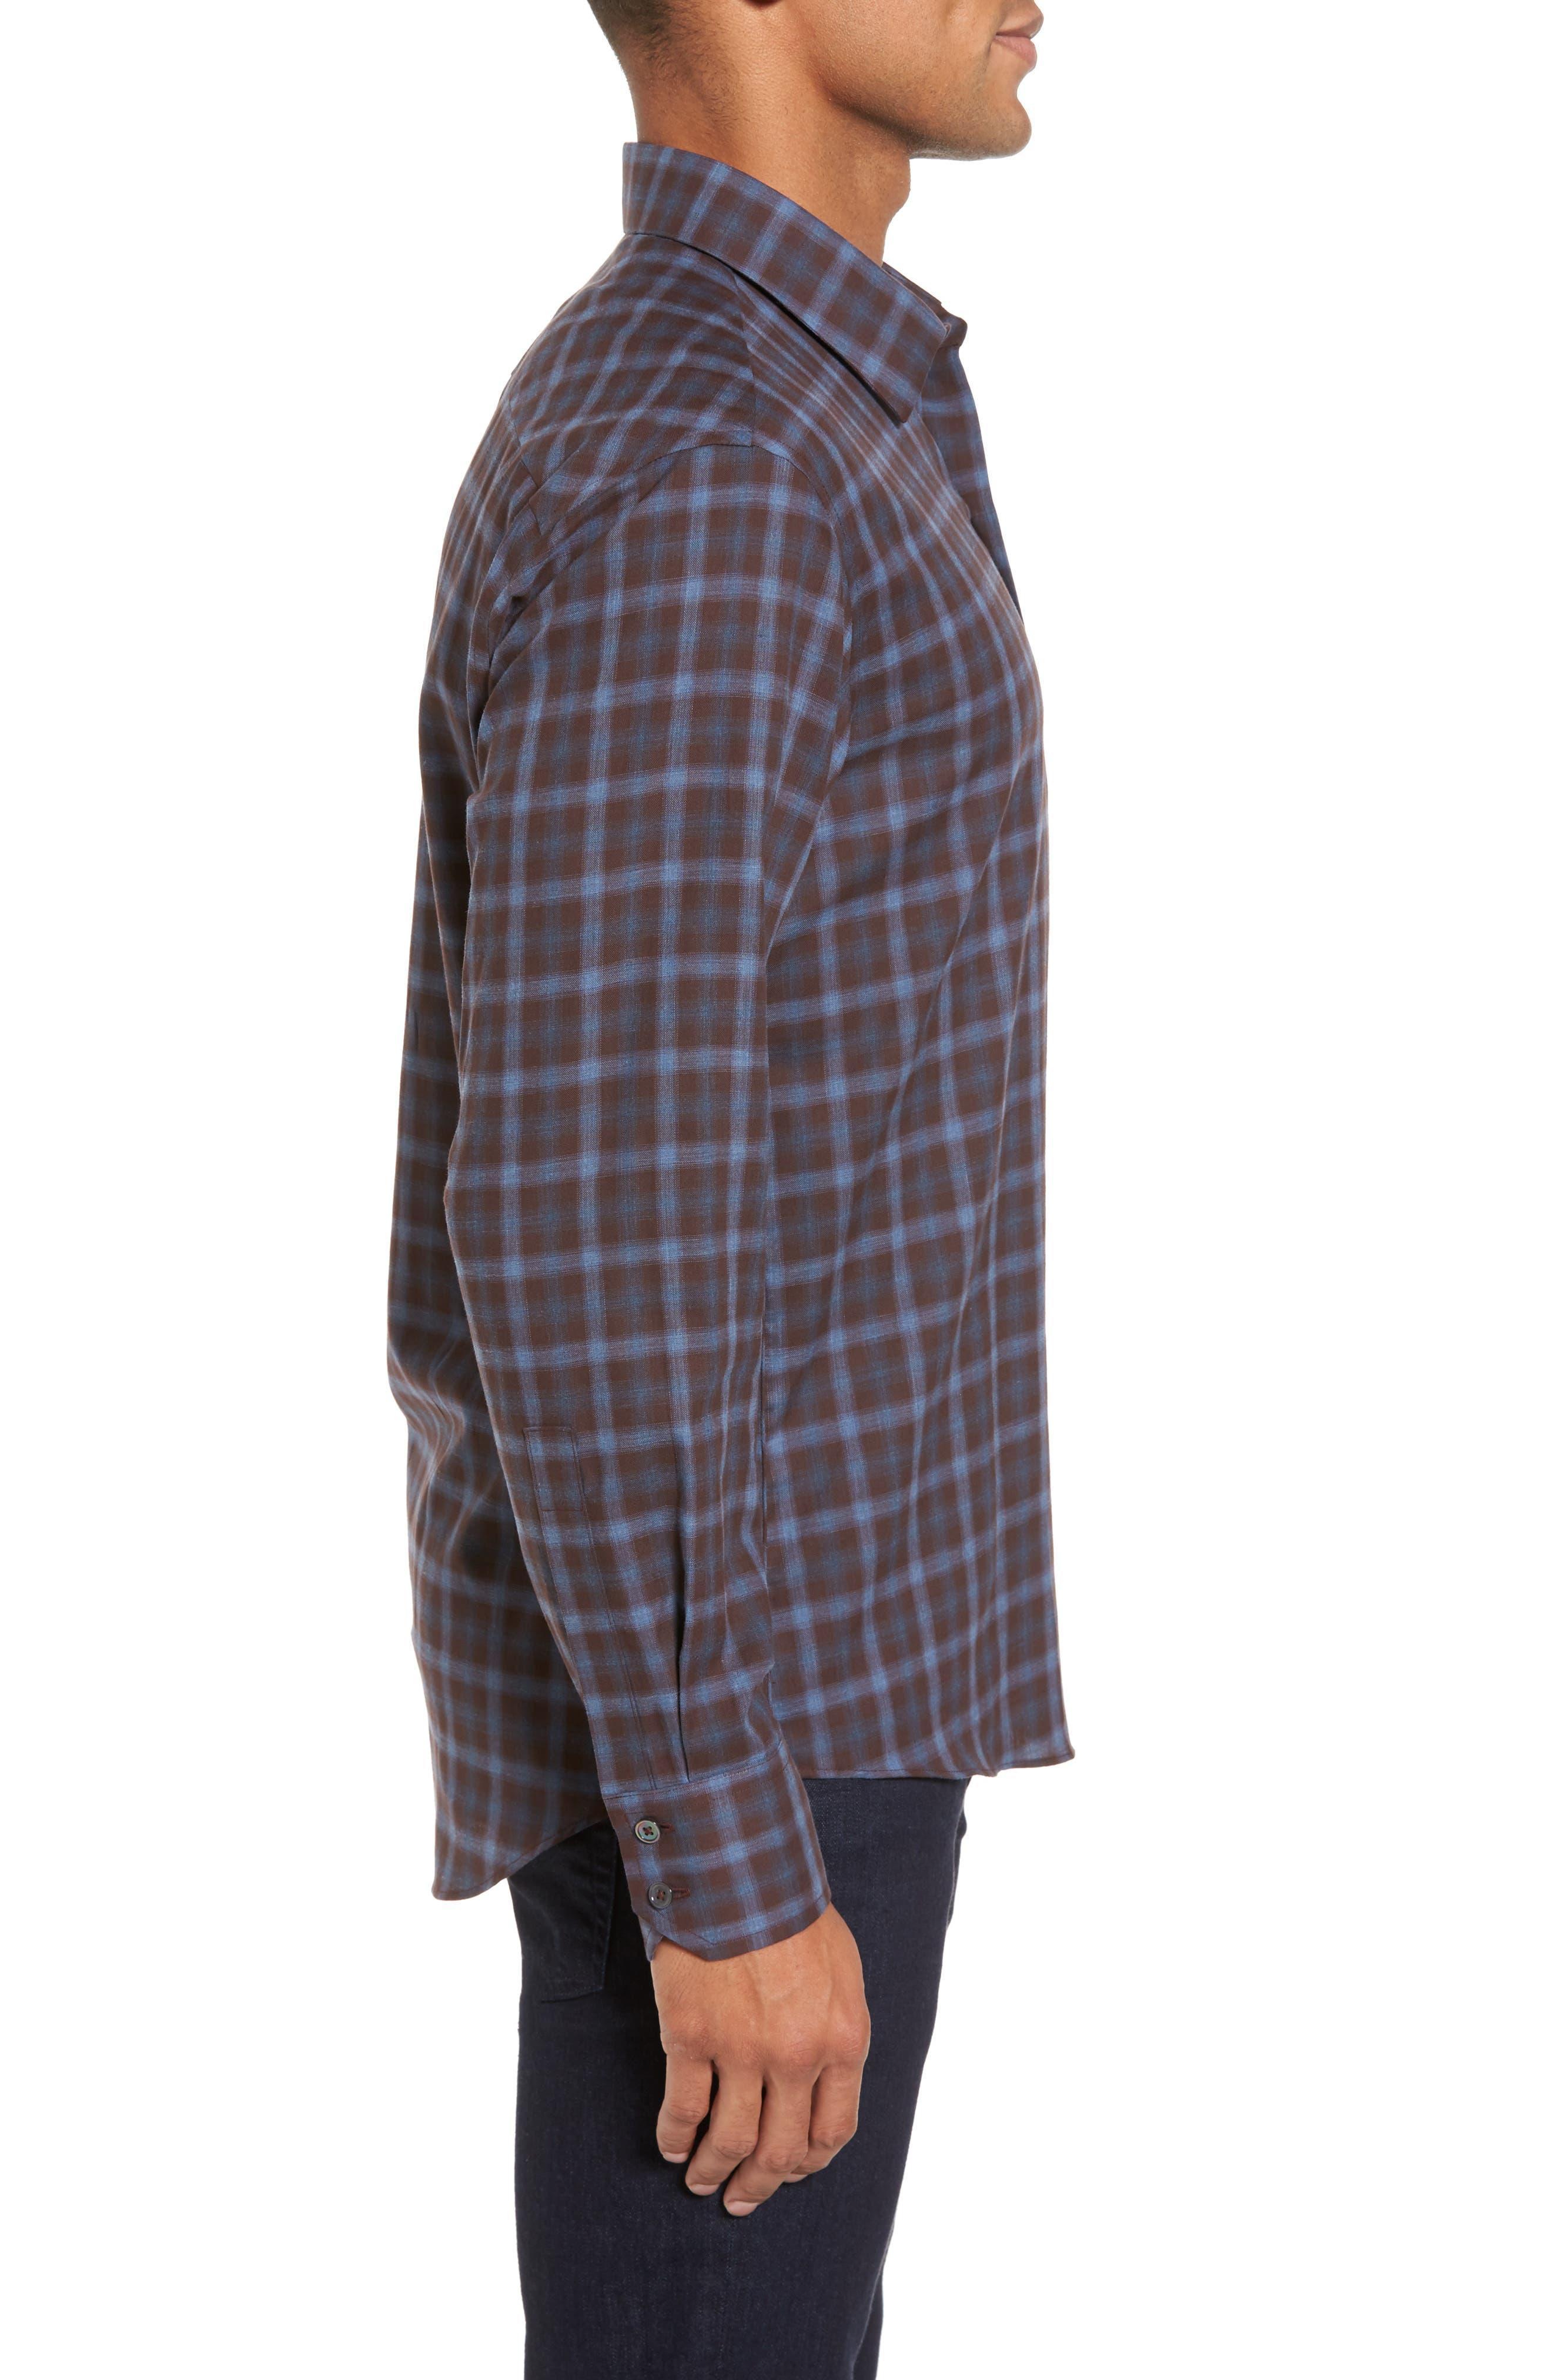 Fathollahi Slim Fit Plaid Sport Shirt,                             Alternate thumbnail 3, color,                             Brown